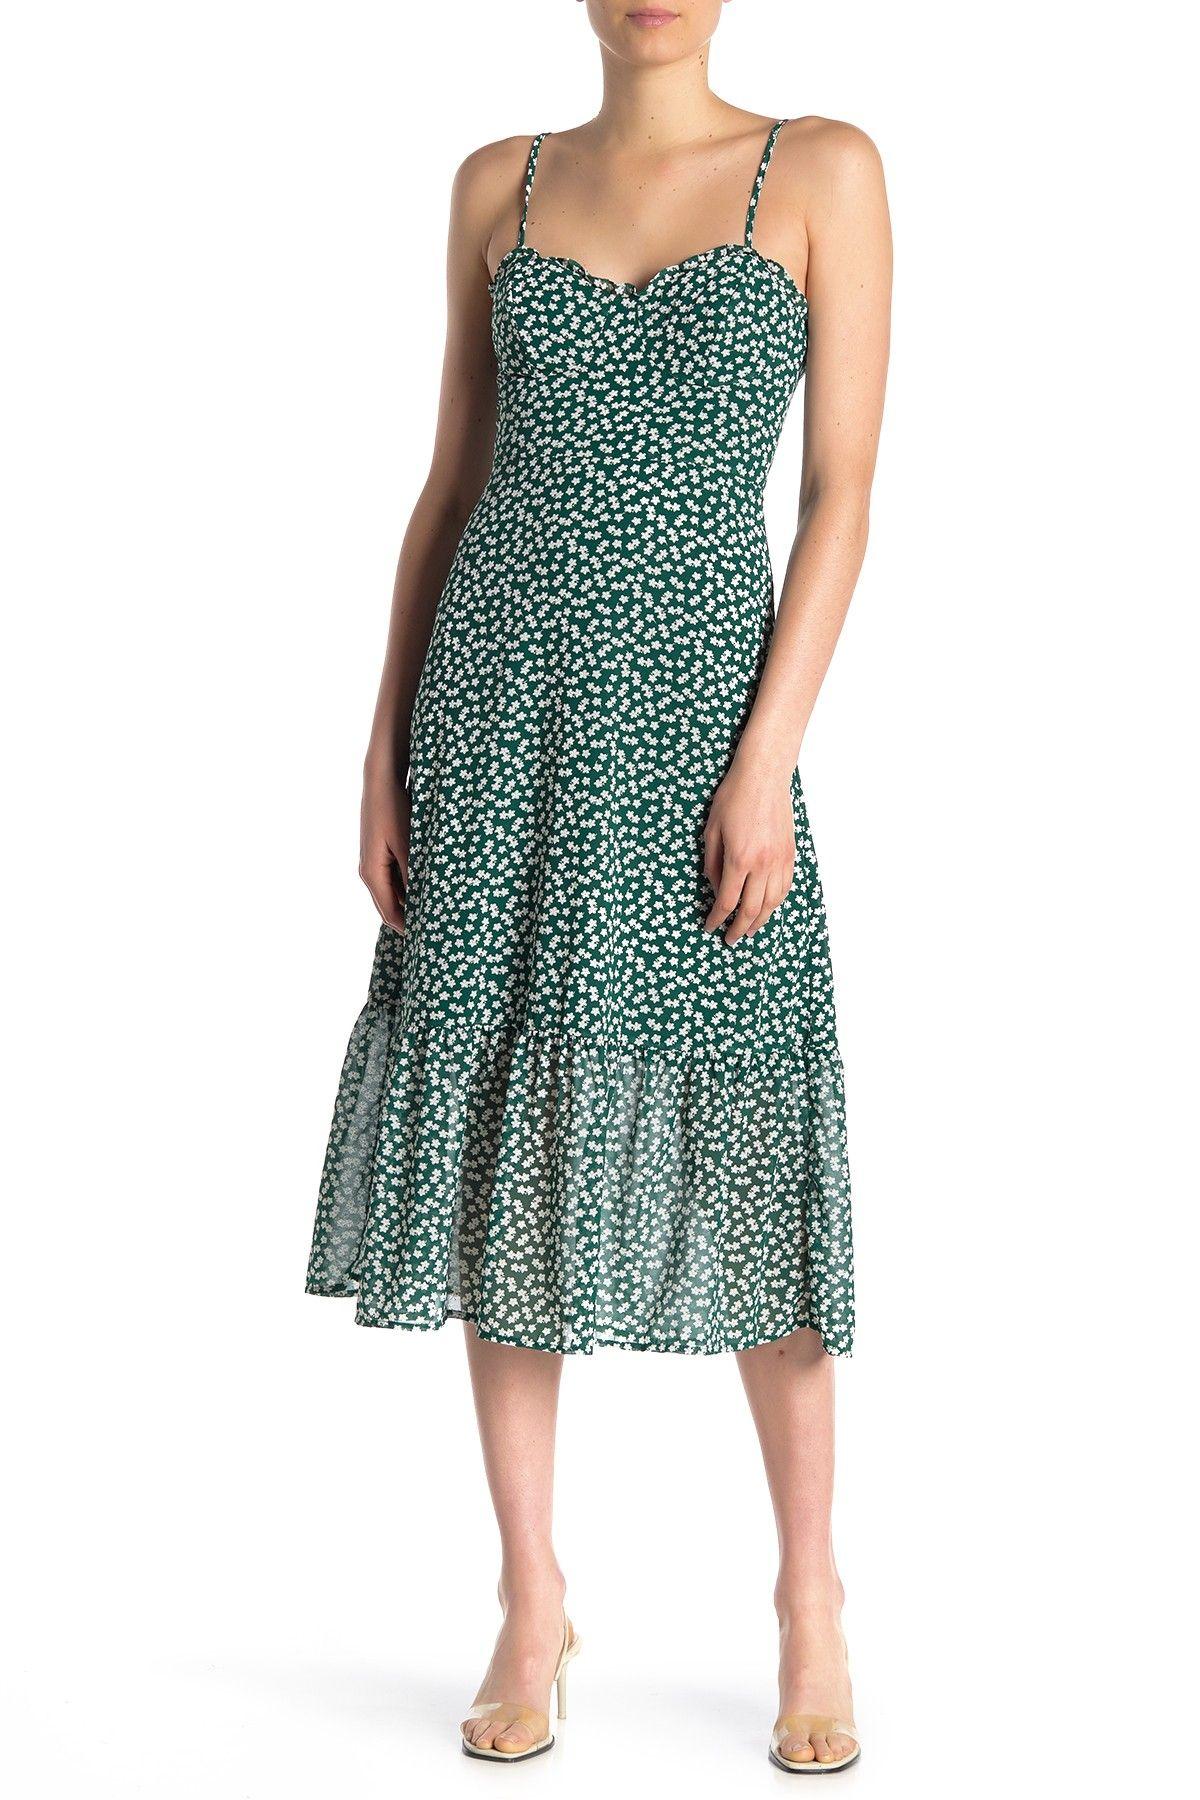 Lush Spaghetti Strap Ruffled Sweetheart Dress Nordstrom Rack Sweetheart Dress Nordstrom Dresses Dresses [ 1800 x 1200 Pixel ]